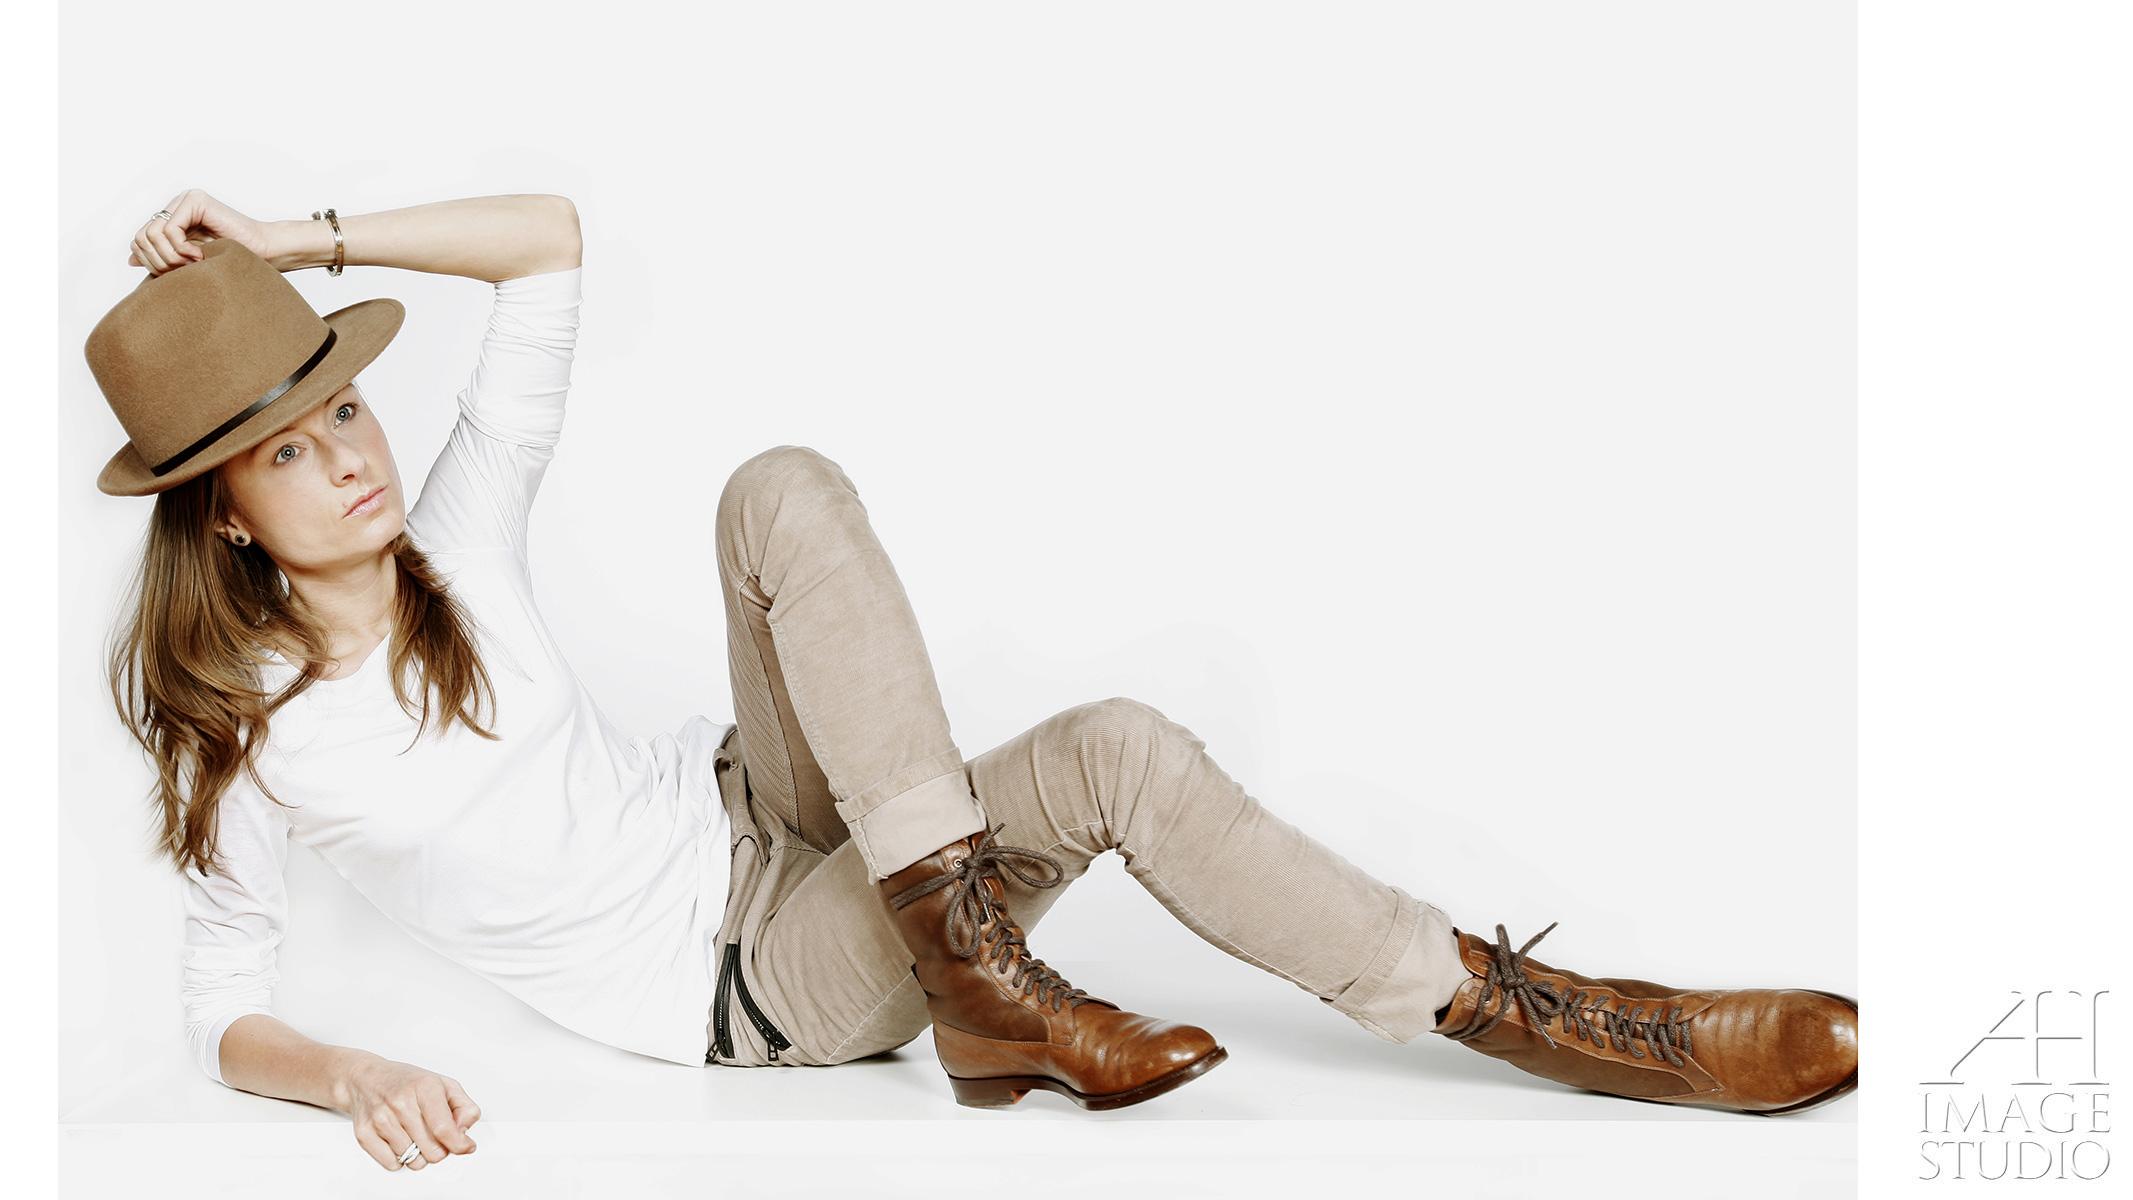 bermondsey studio portrait hat boots fashion lighting model self-portrait studio